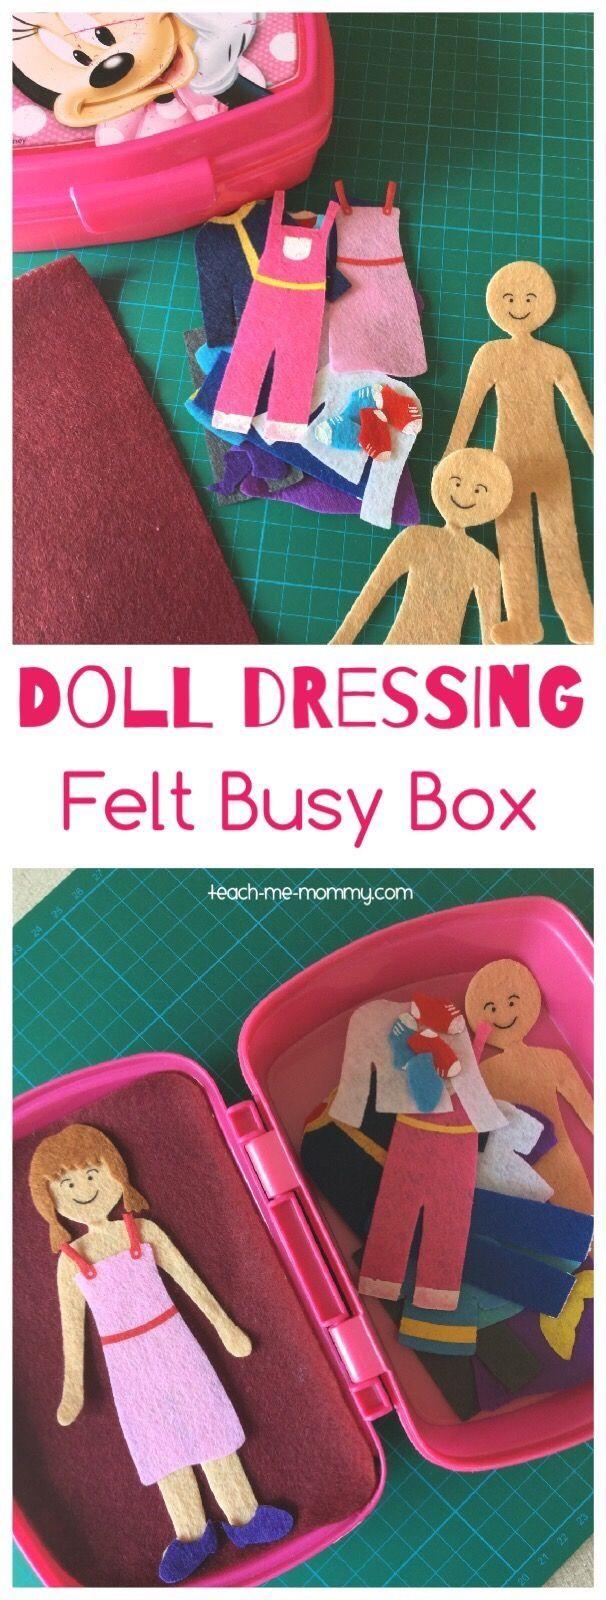 Doll Dressing Felt Busy Box kids would love!